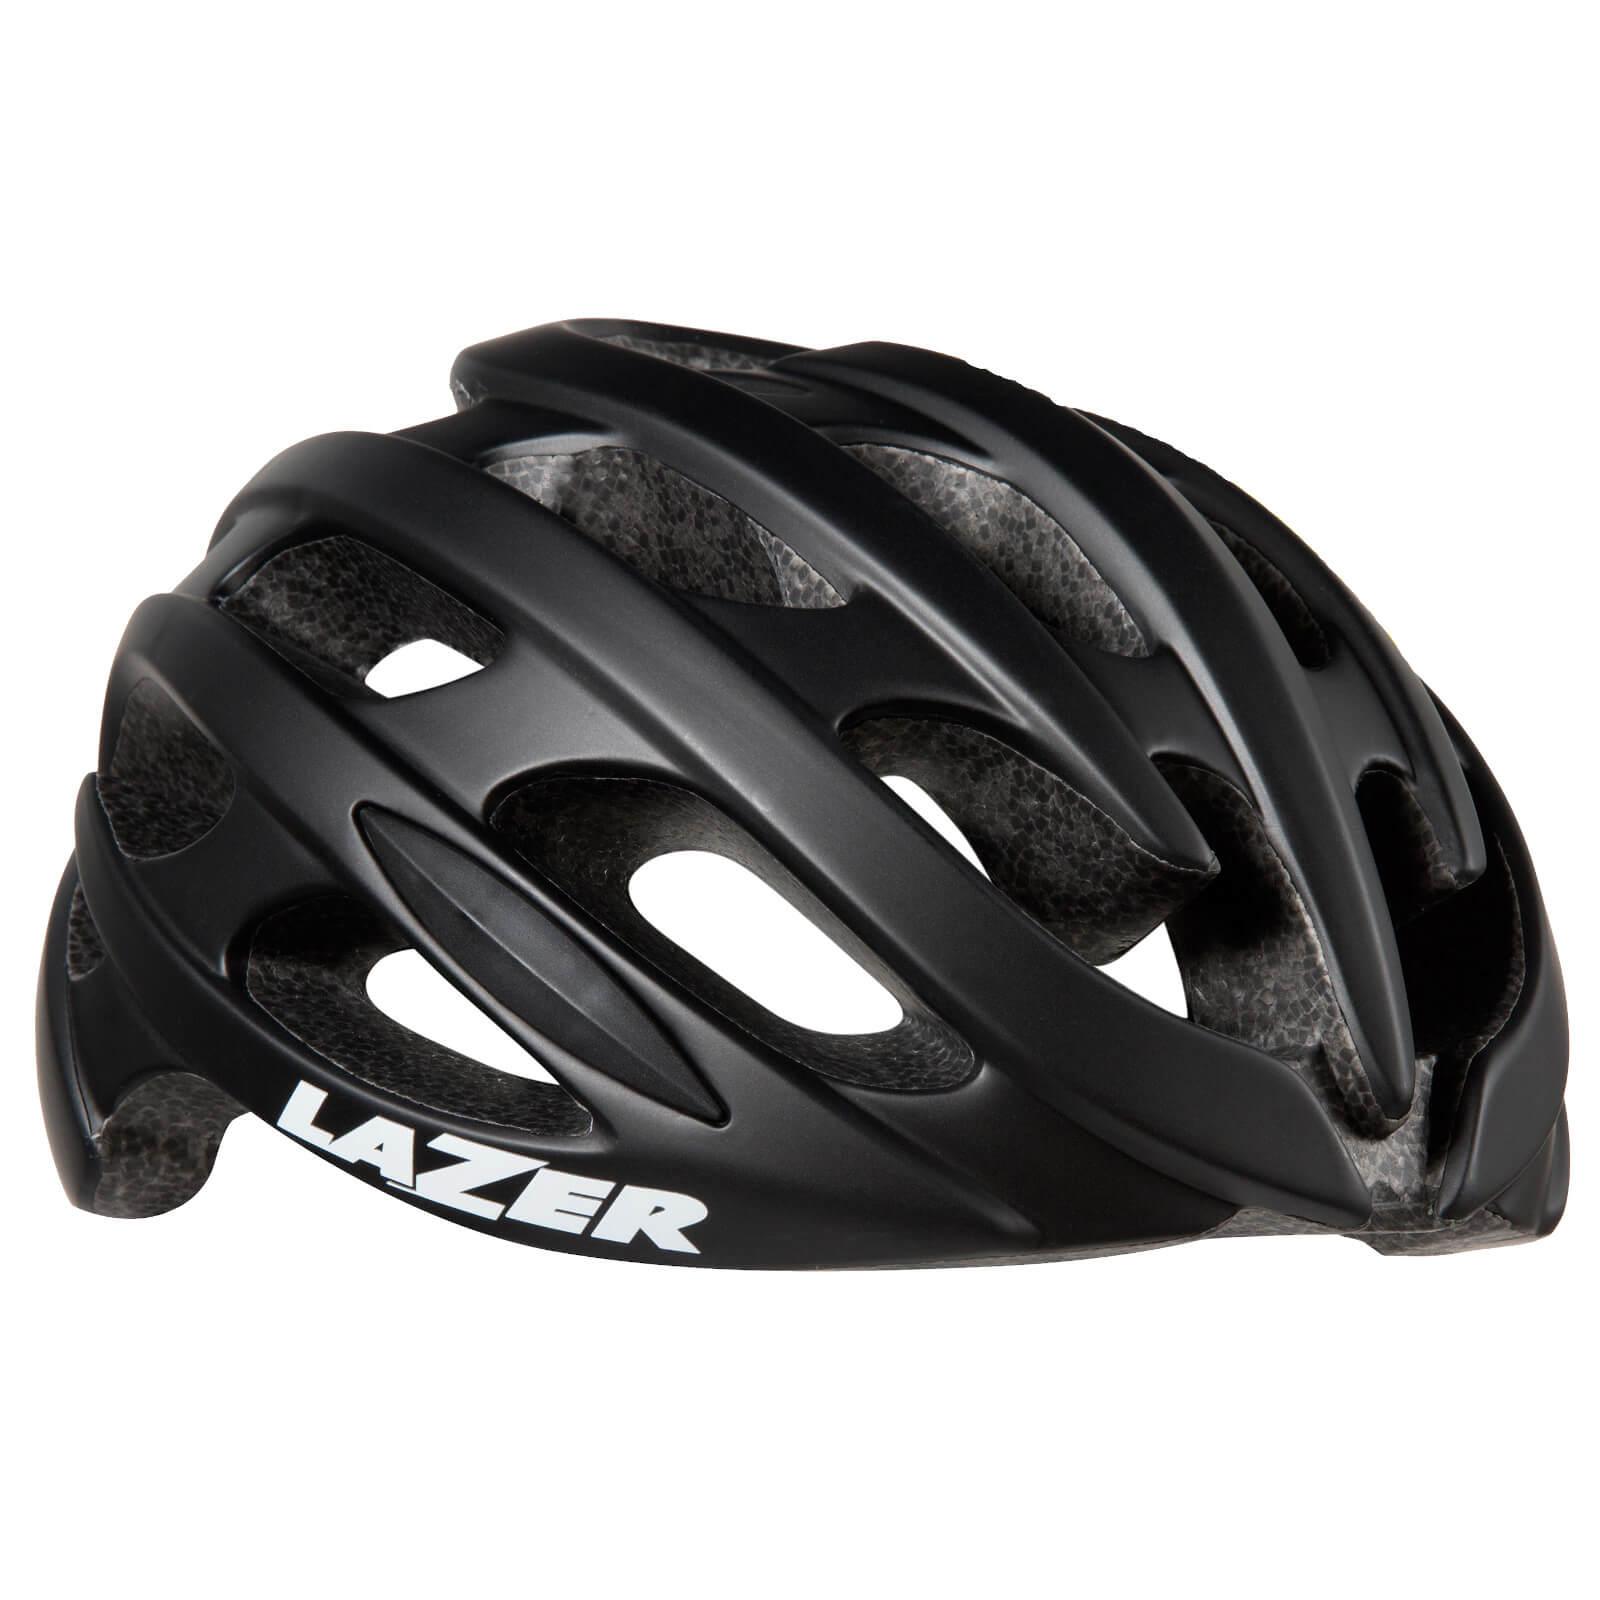 Lazer Blade MIPS Road Helmet - XL - Matte Black